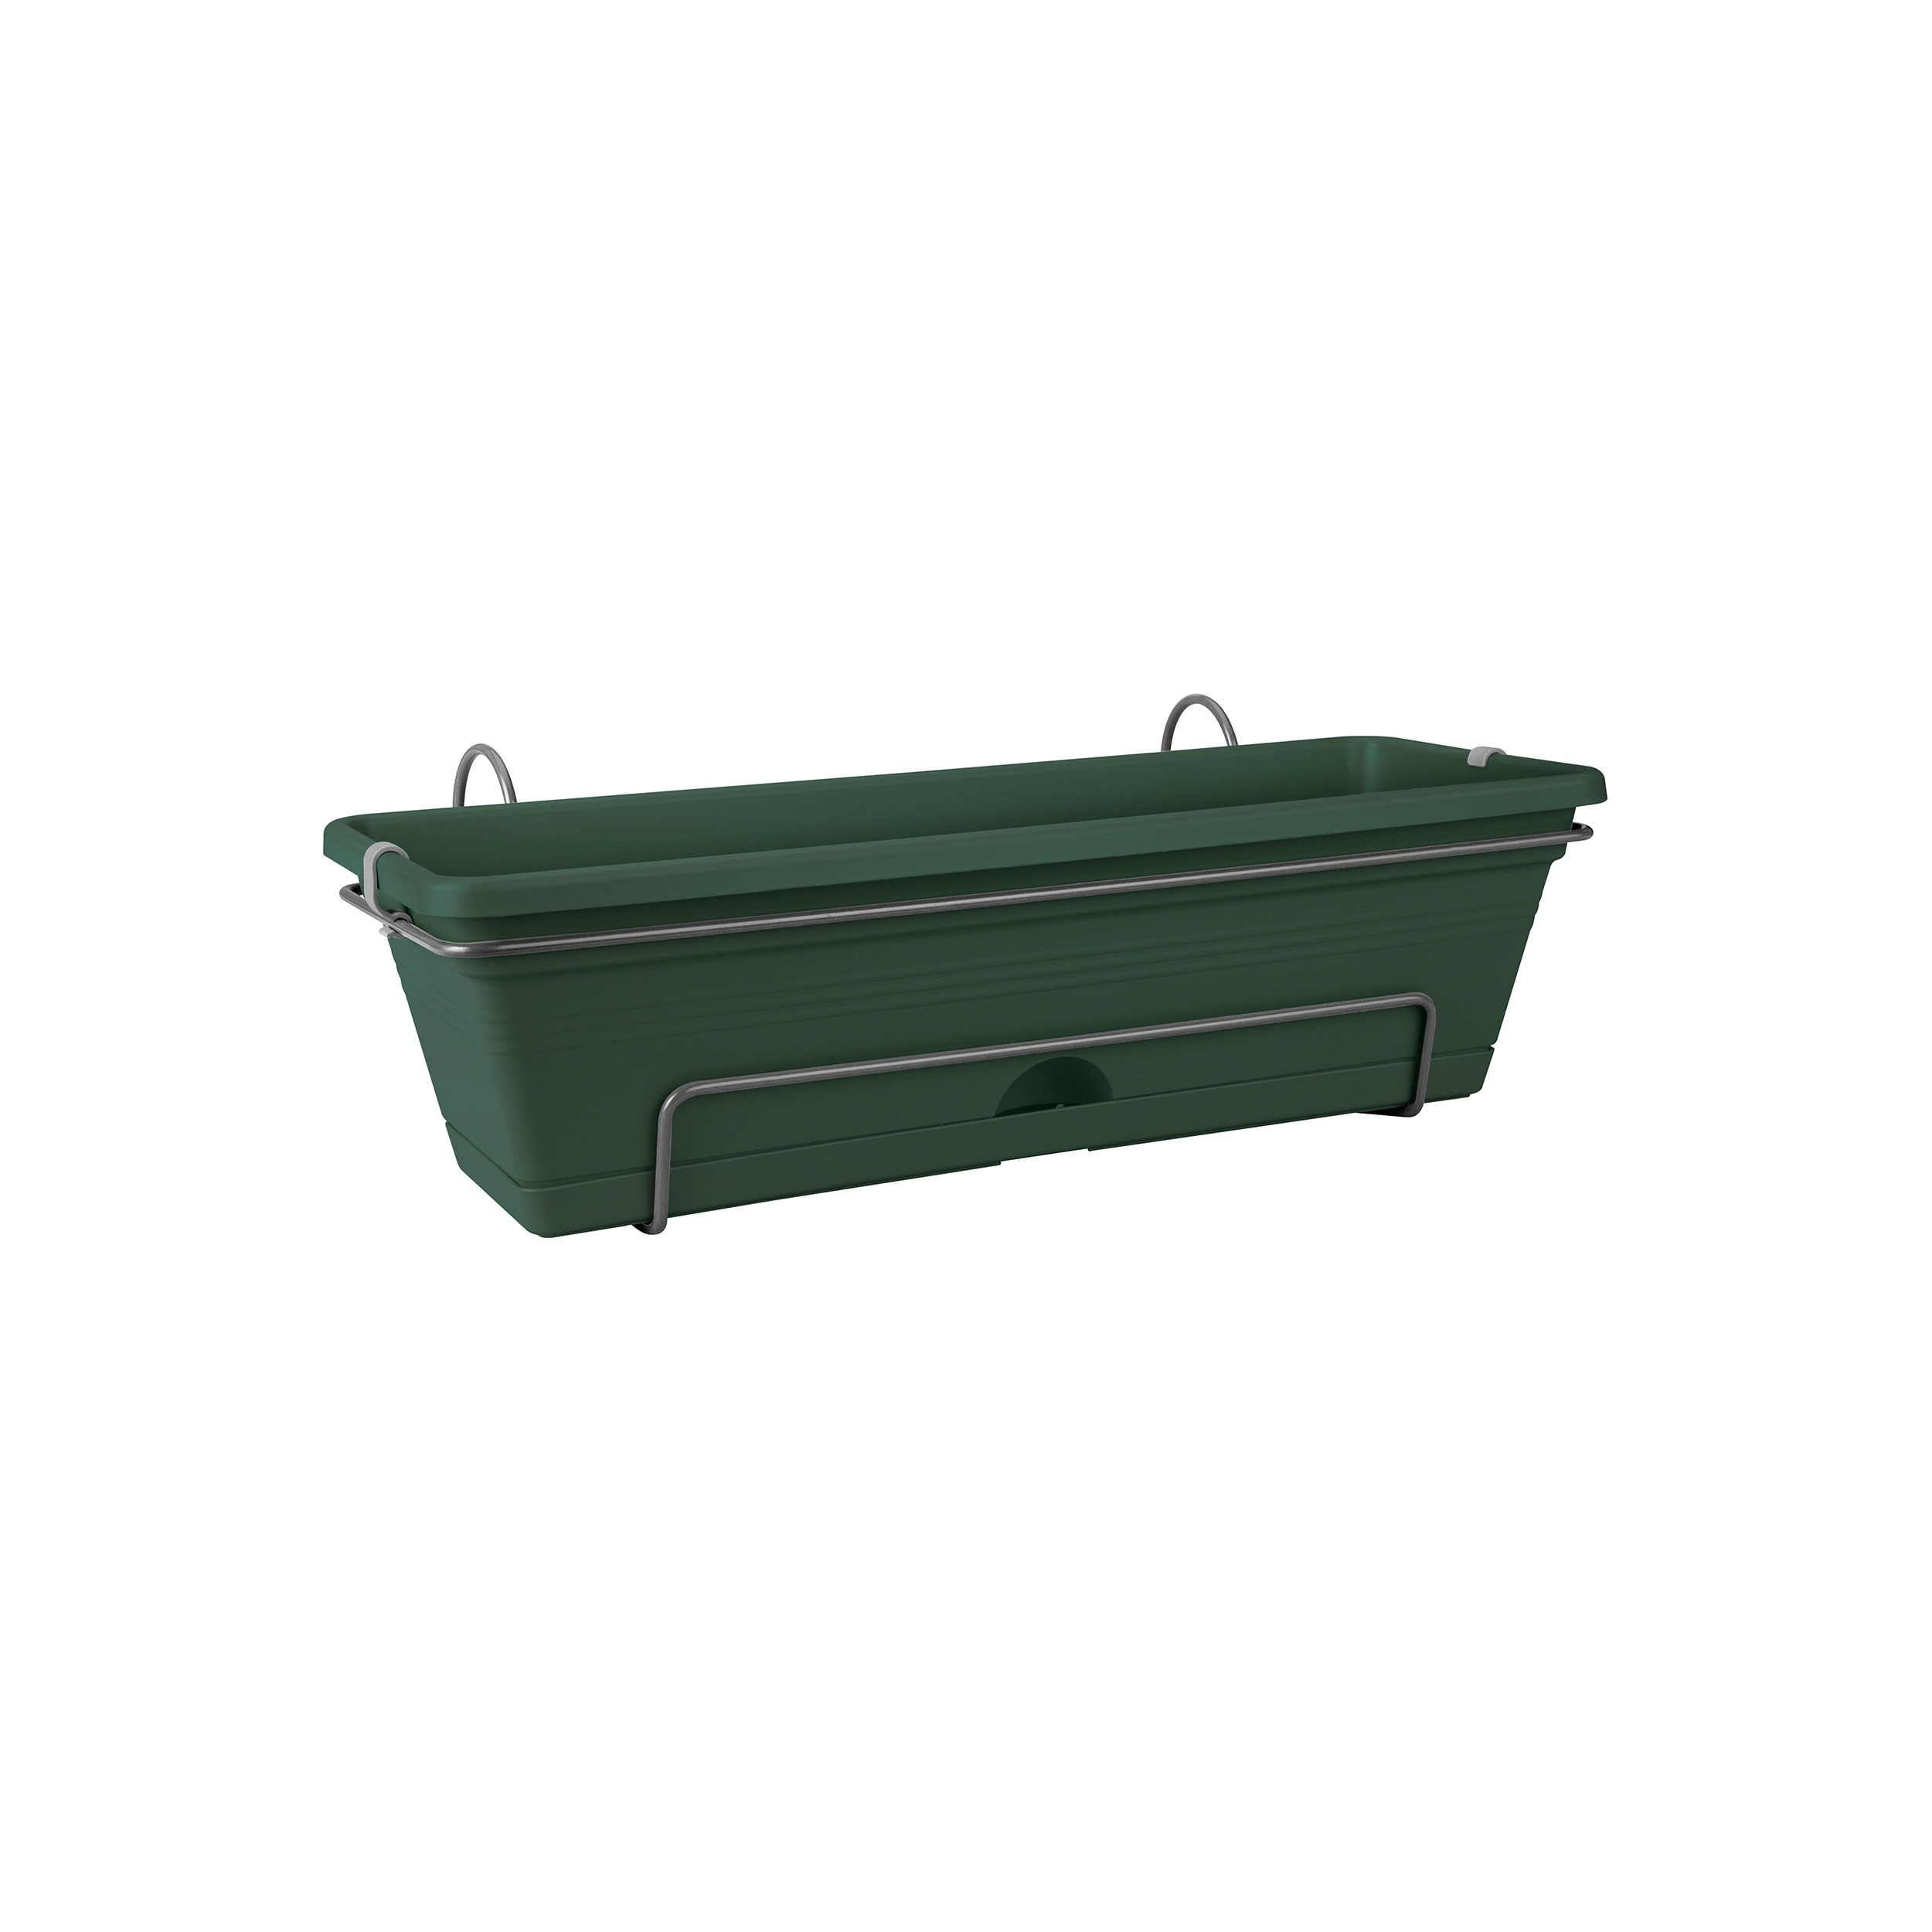 elho blumenkasten set green basics trough all in one l nge 50cm mit halterung ebay. Black Bedroom Furniture Sets. Home Design Ideas